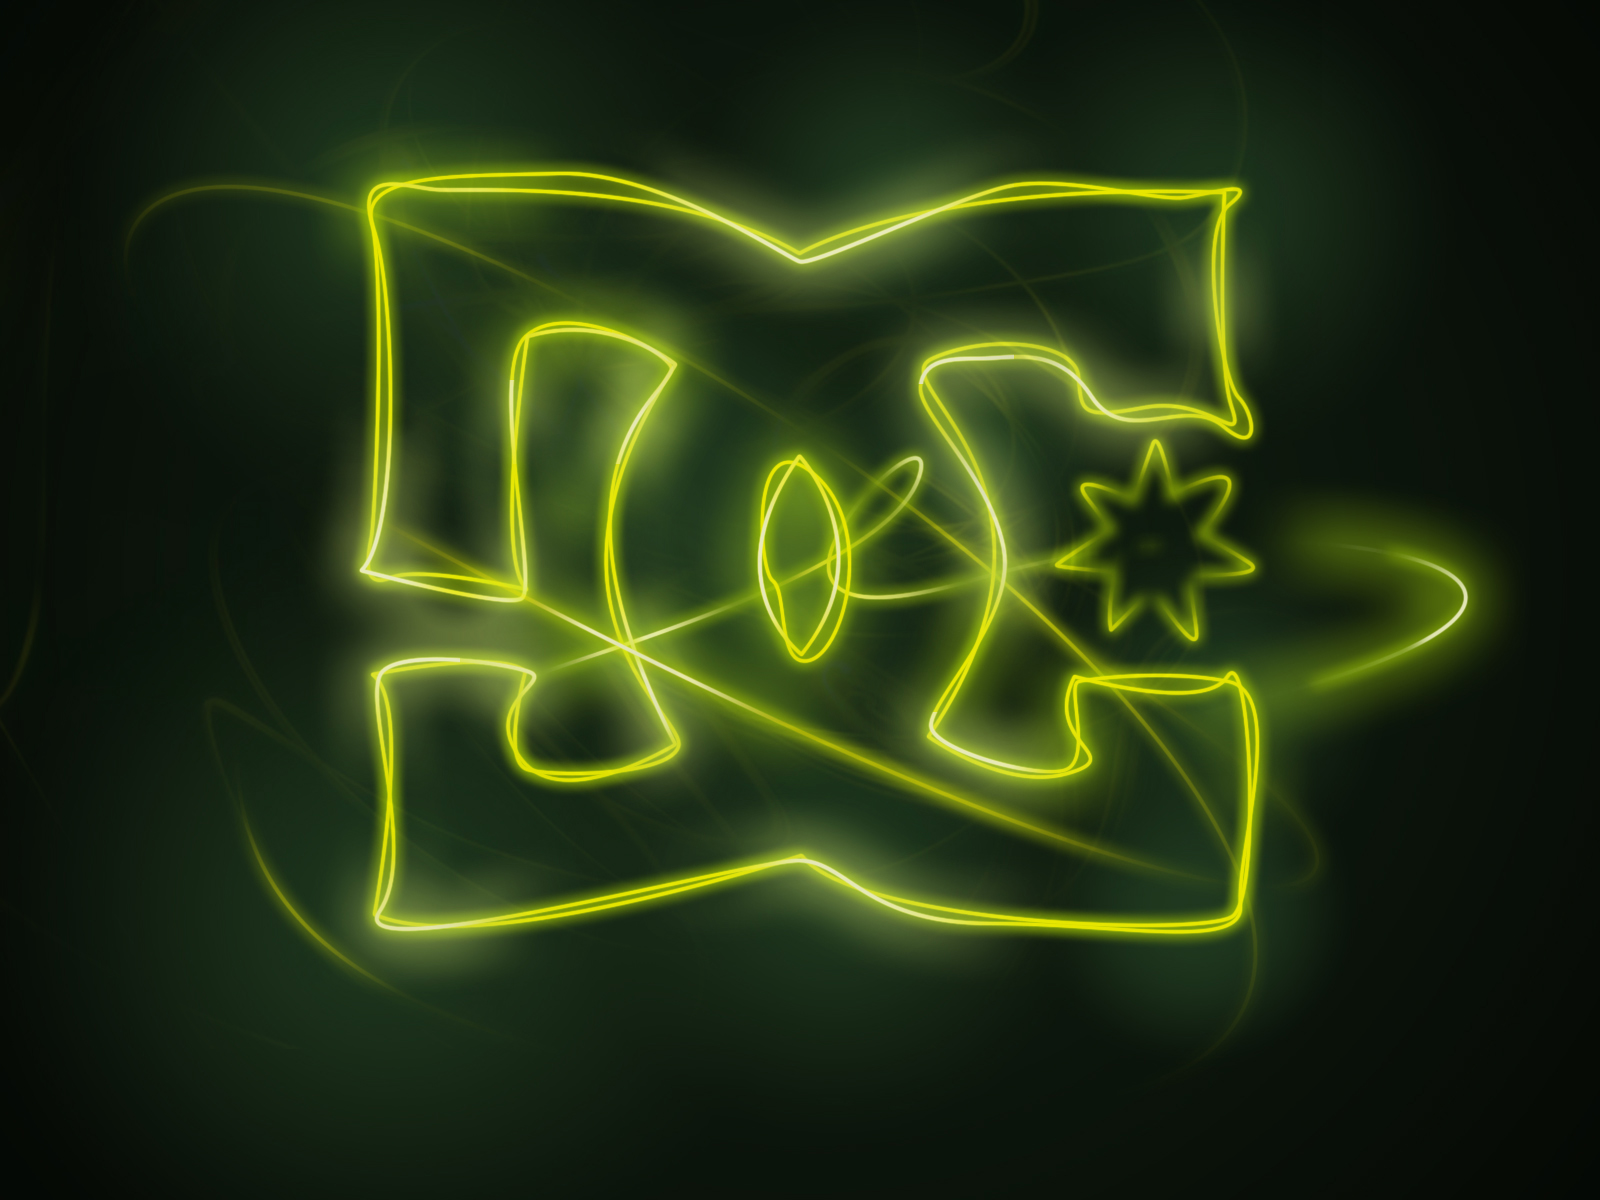 Ken Block Hd Wallpaper All Logos Dc Logo